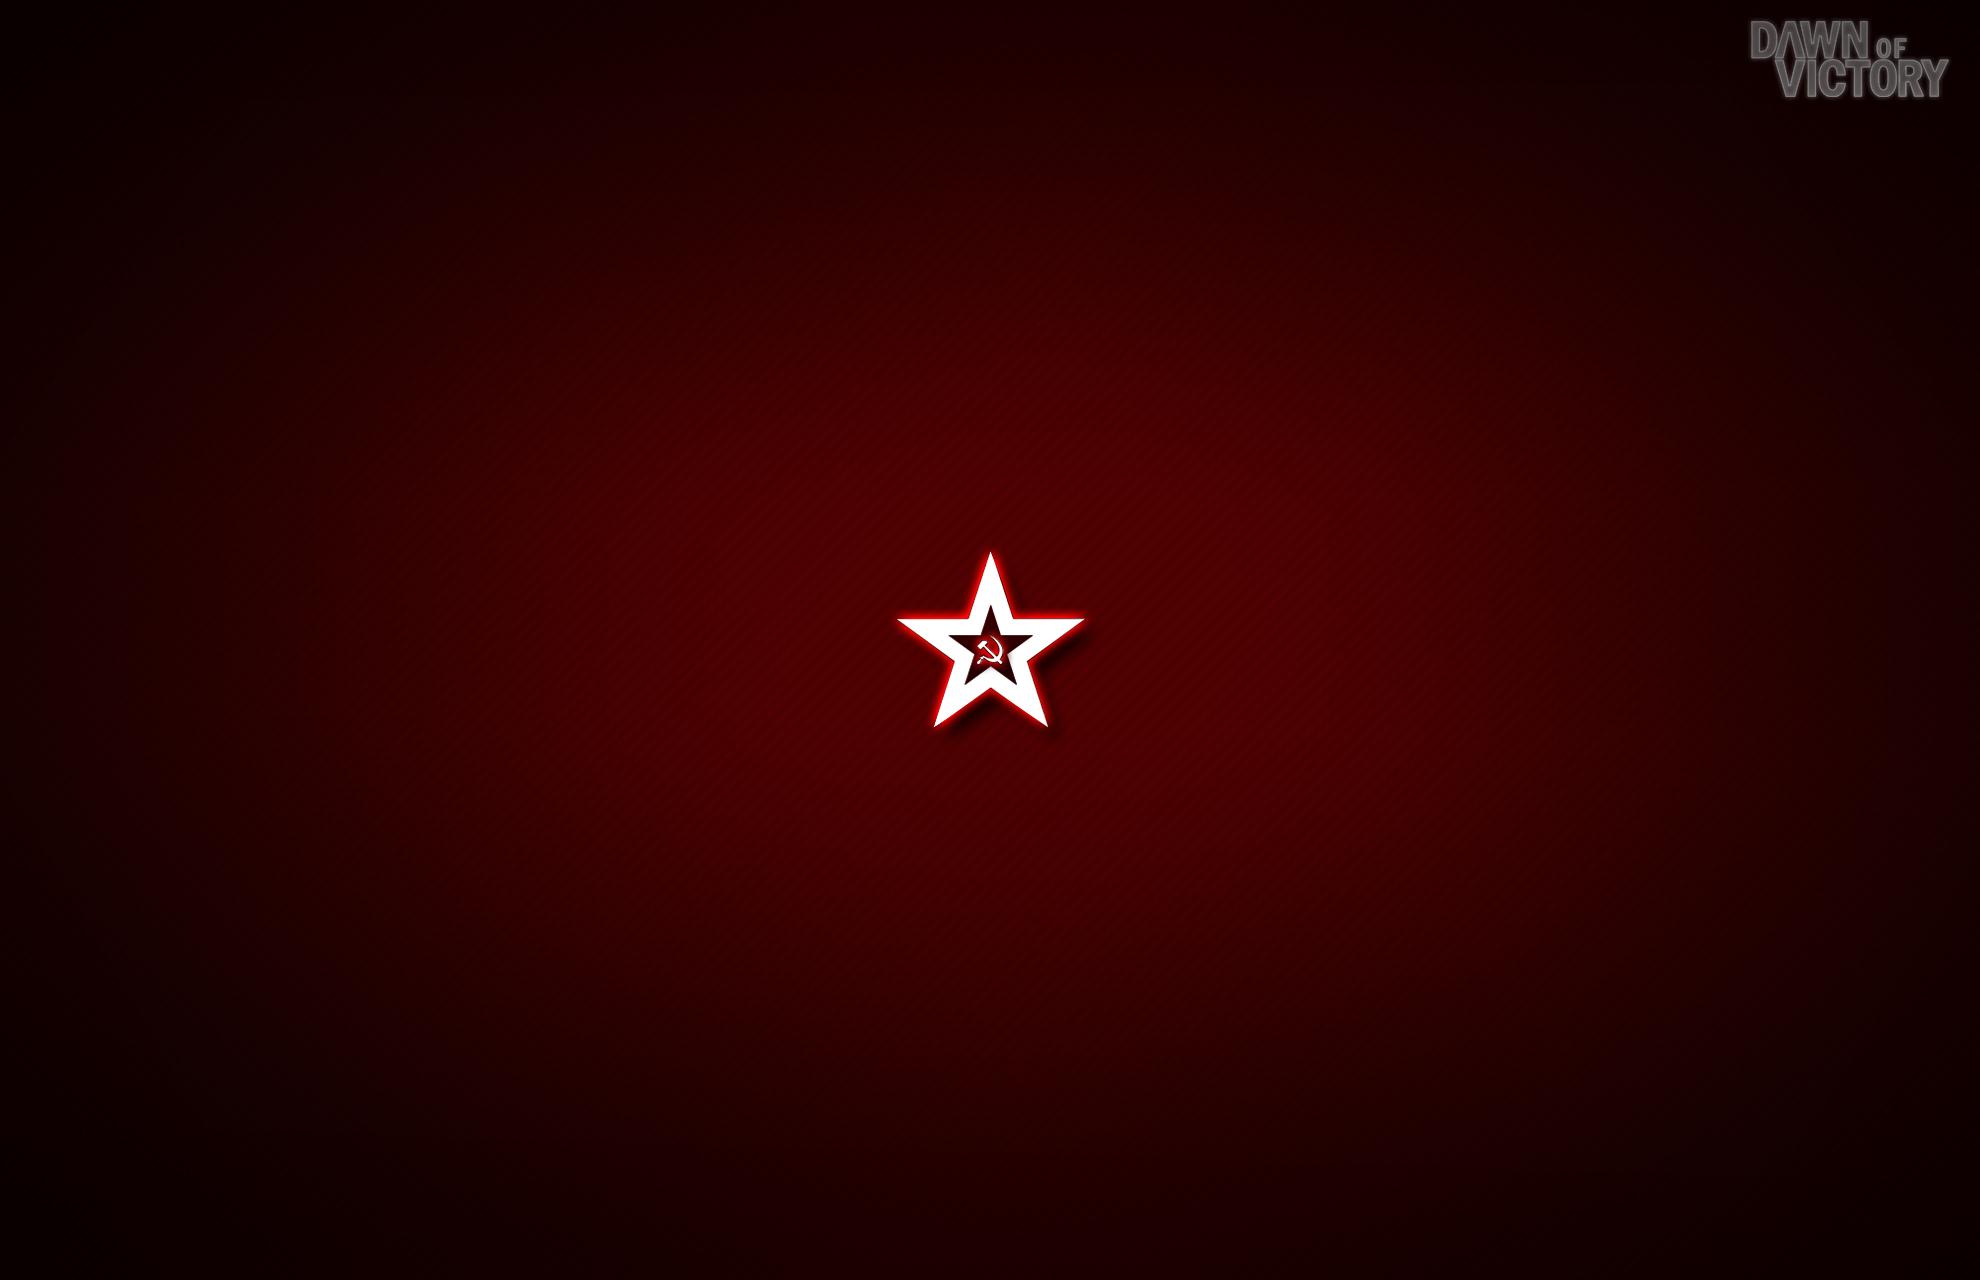 Top 50 Socialist Backgrounds UVO46 Amazing Wallpapers 1980x1280